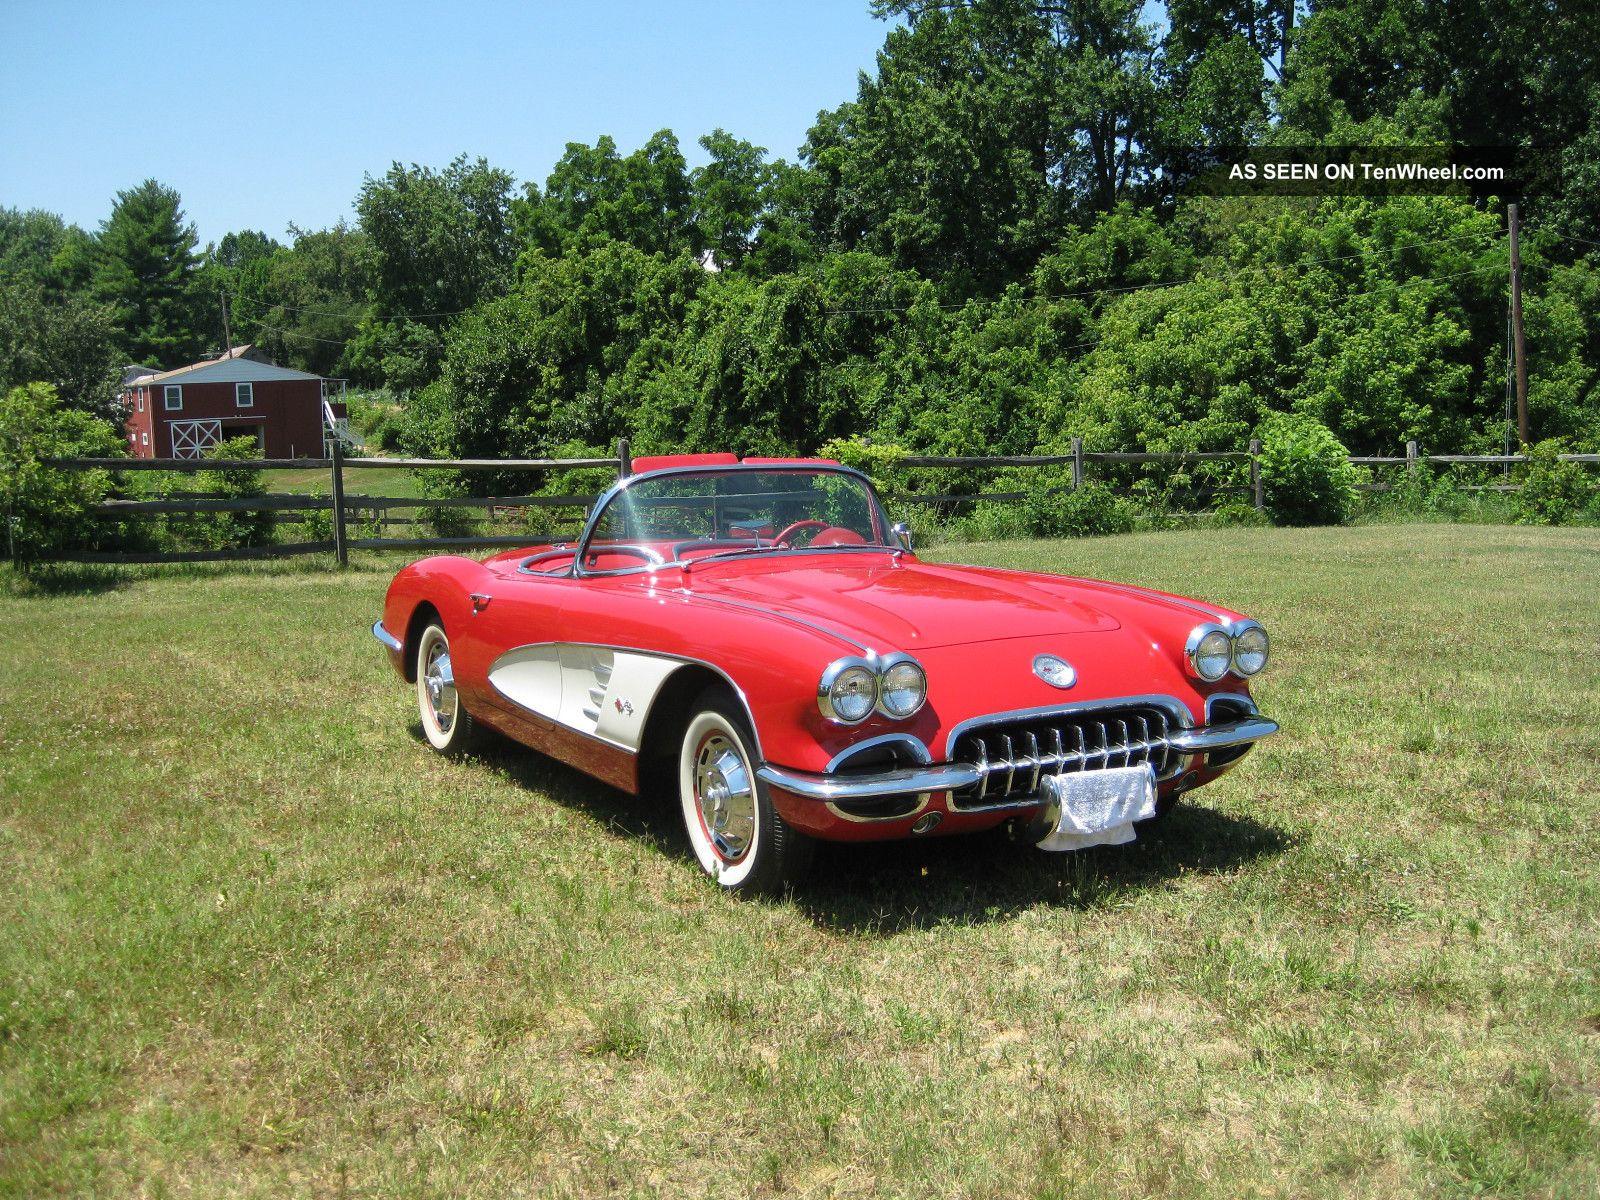 1960 Corvette Corvette photo